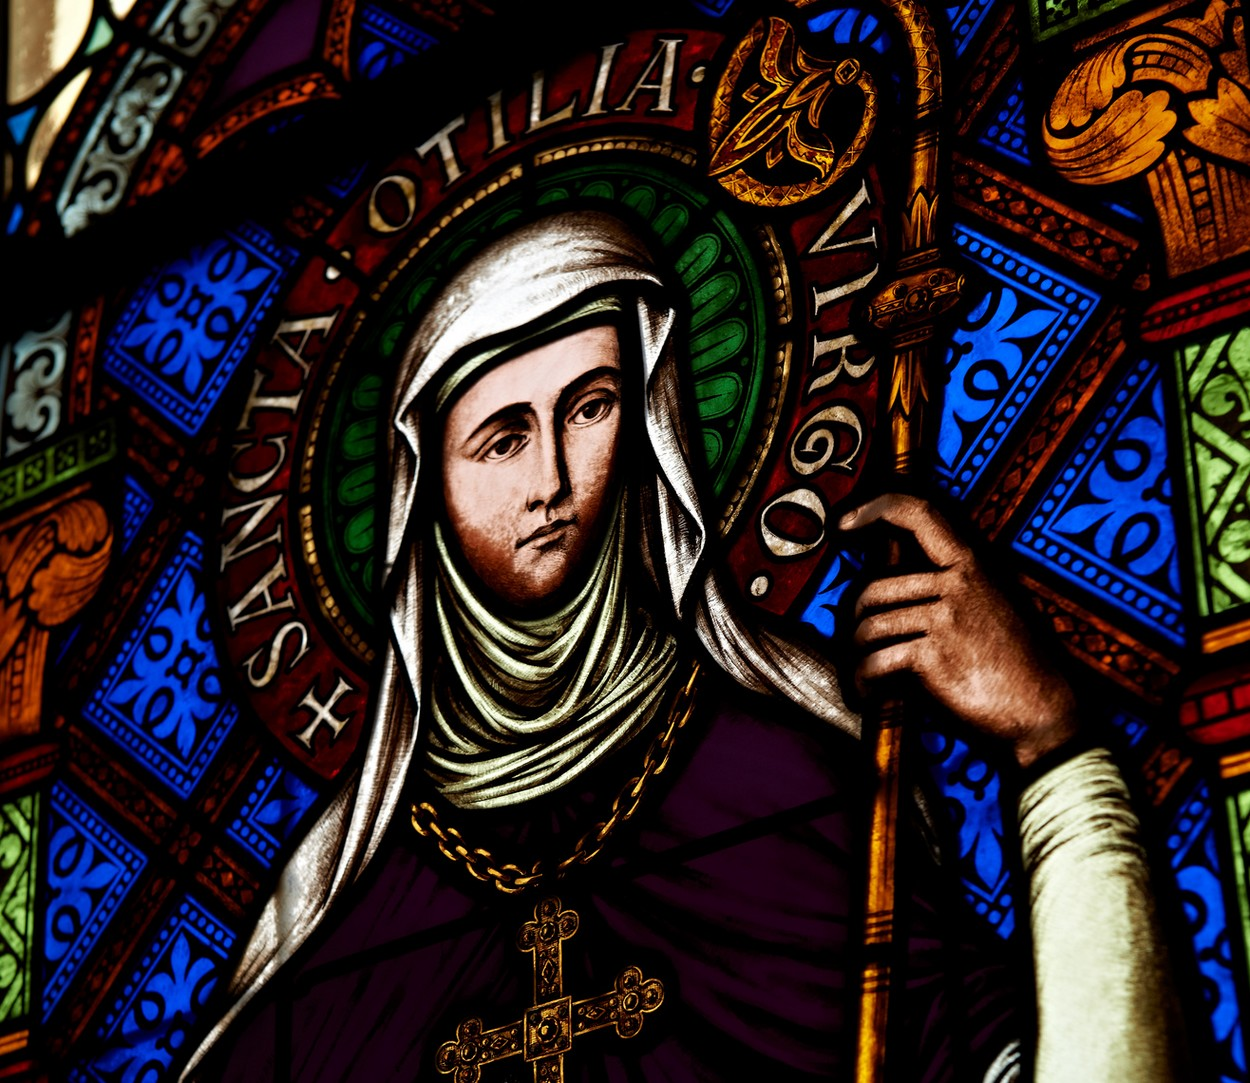 The legend of Sainte-Odile